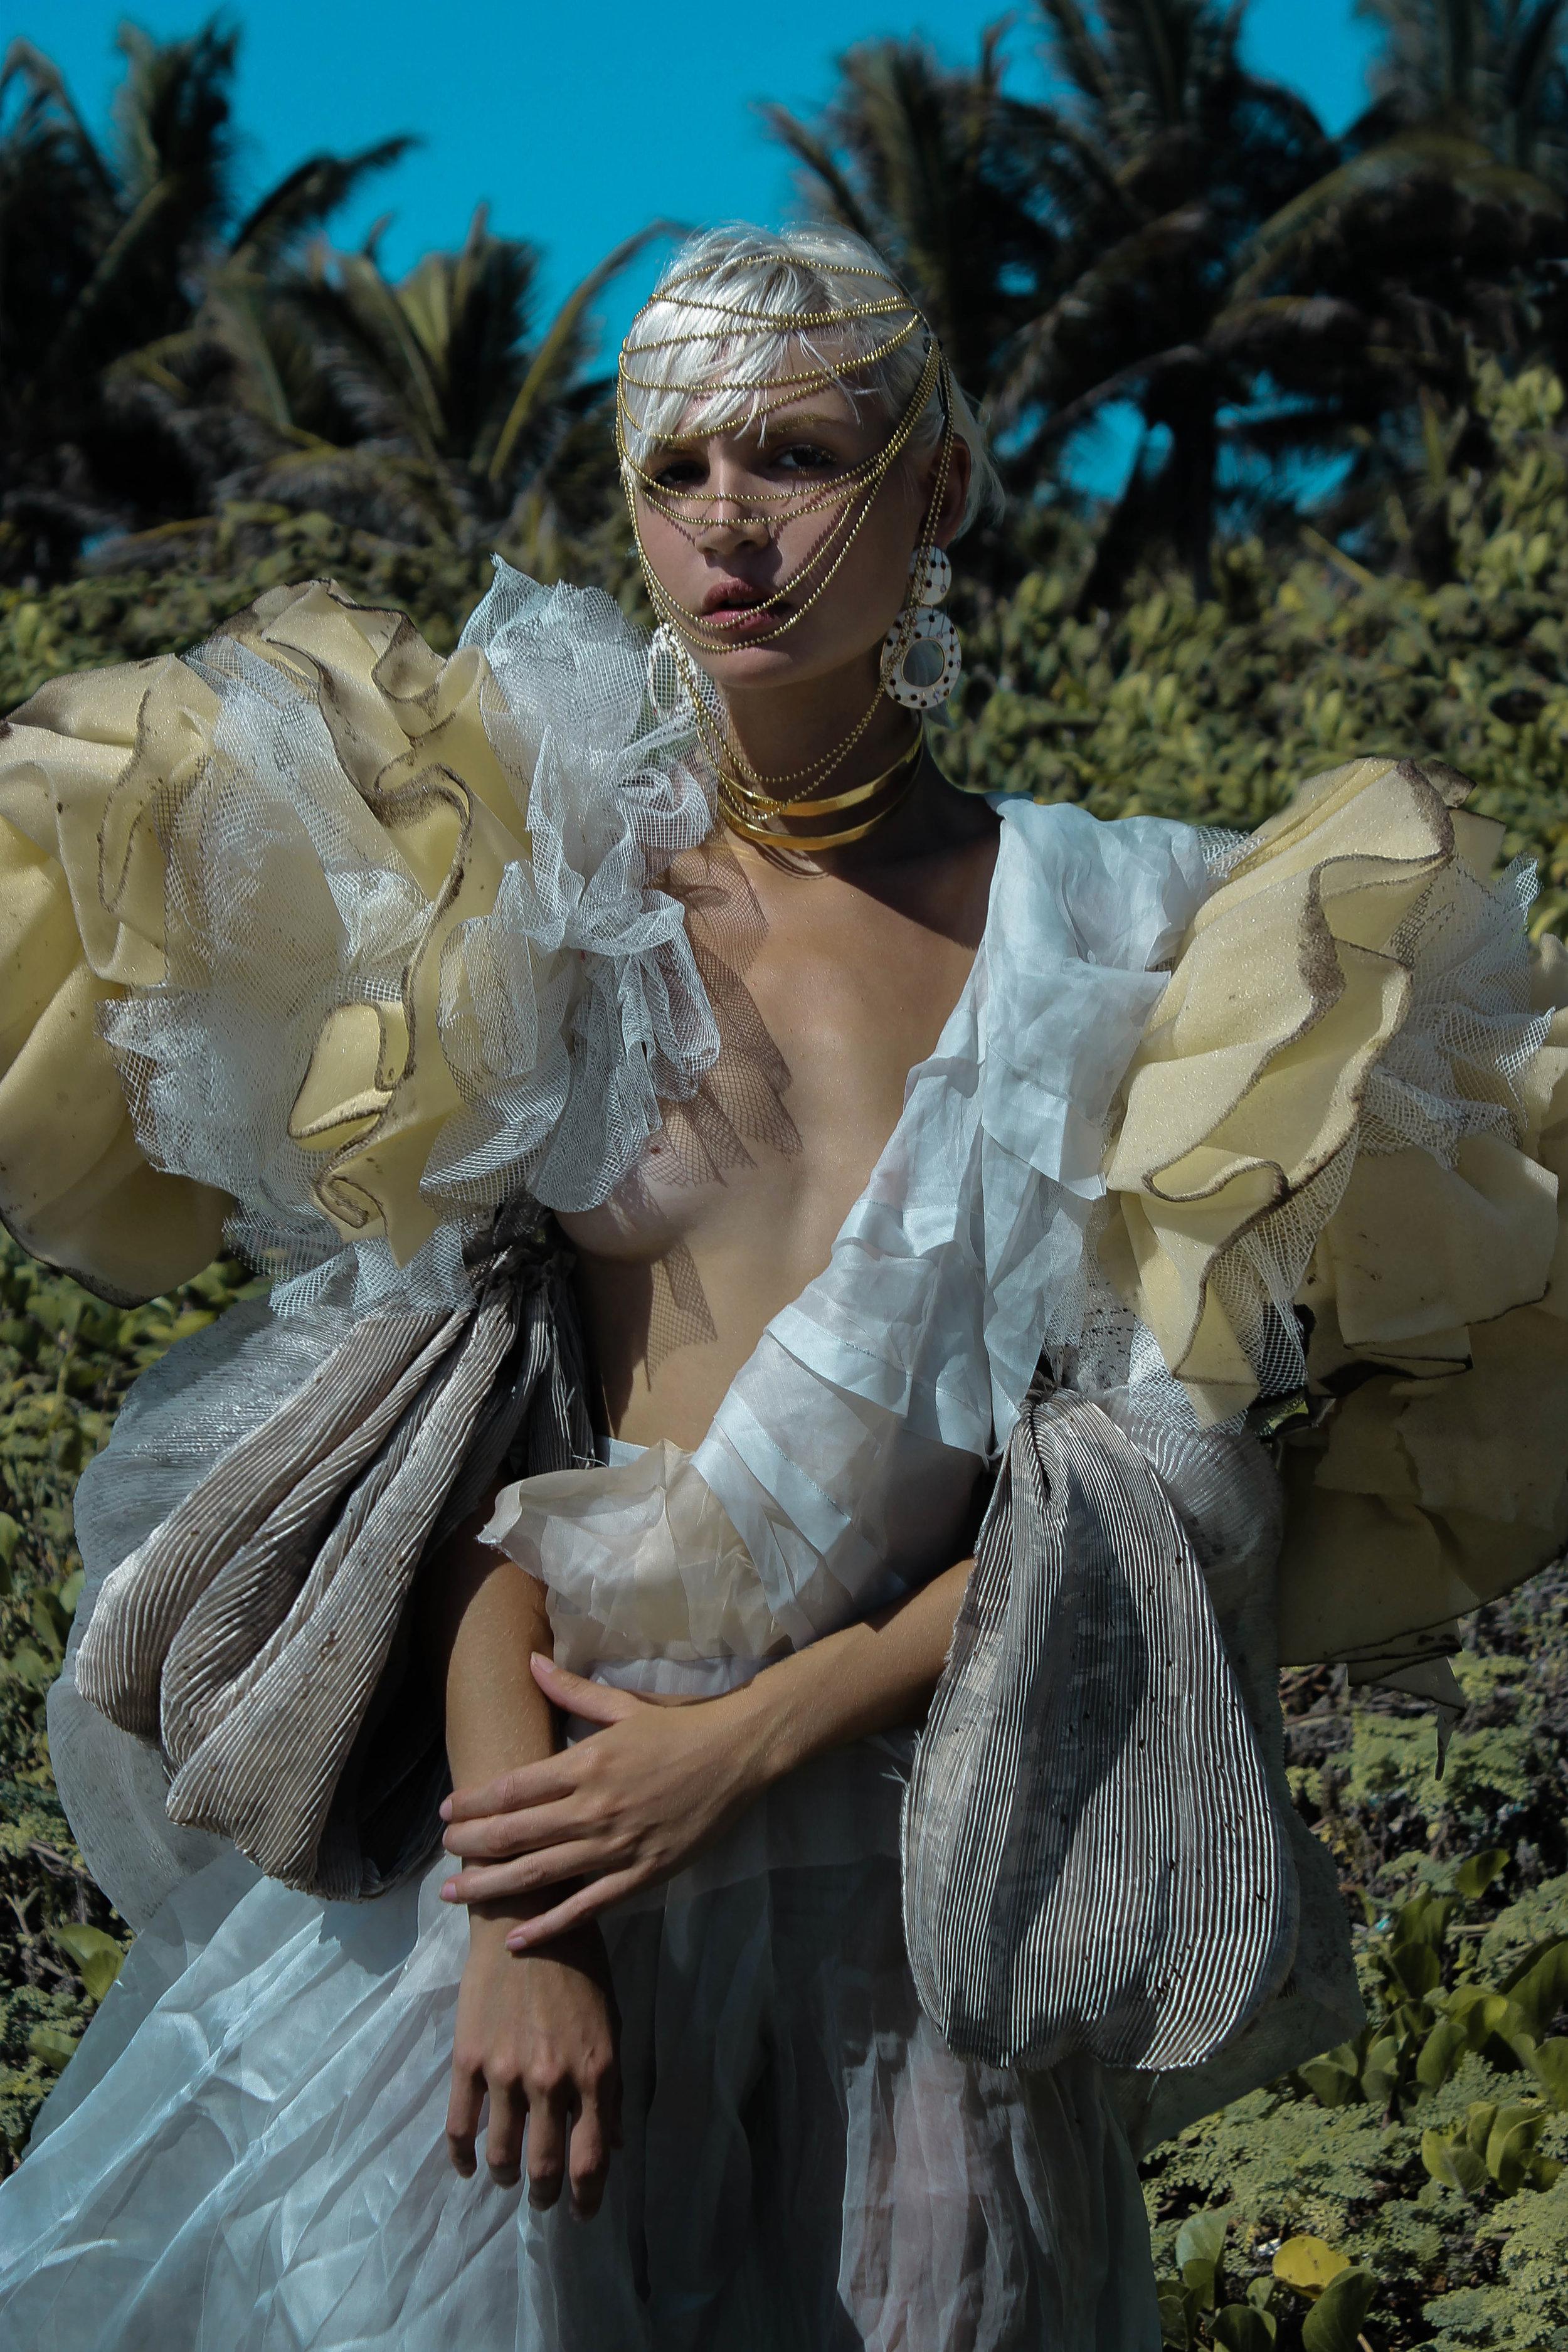 JUMPSUIT: Ana Blumen @ana_blumen JACKET: Maria Ponce @maria.ponce.n NECKLACE: Felina @felinajewelry HEADPIECE: Stylist Own